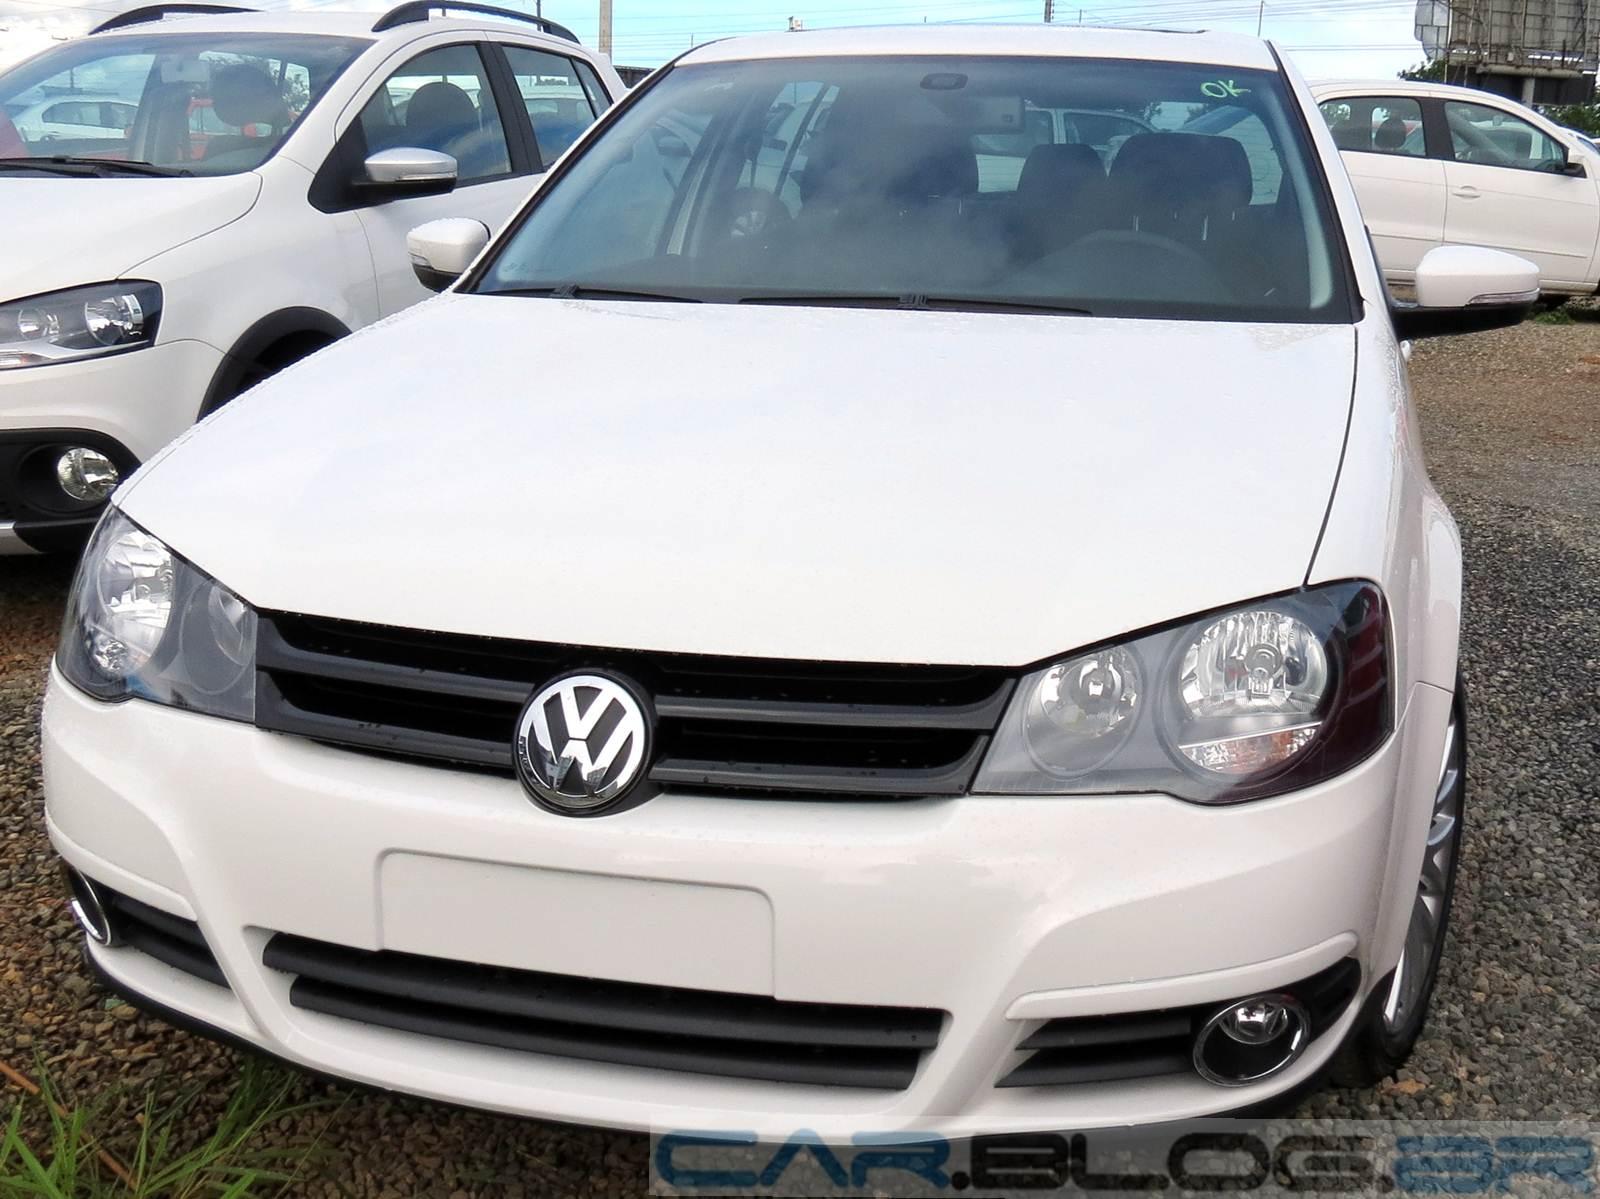 VW Golf Sportline 2014